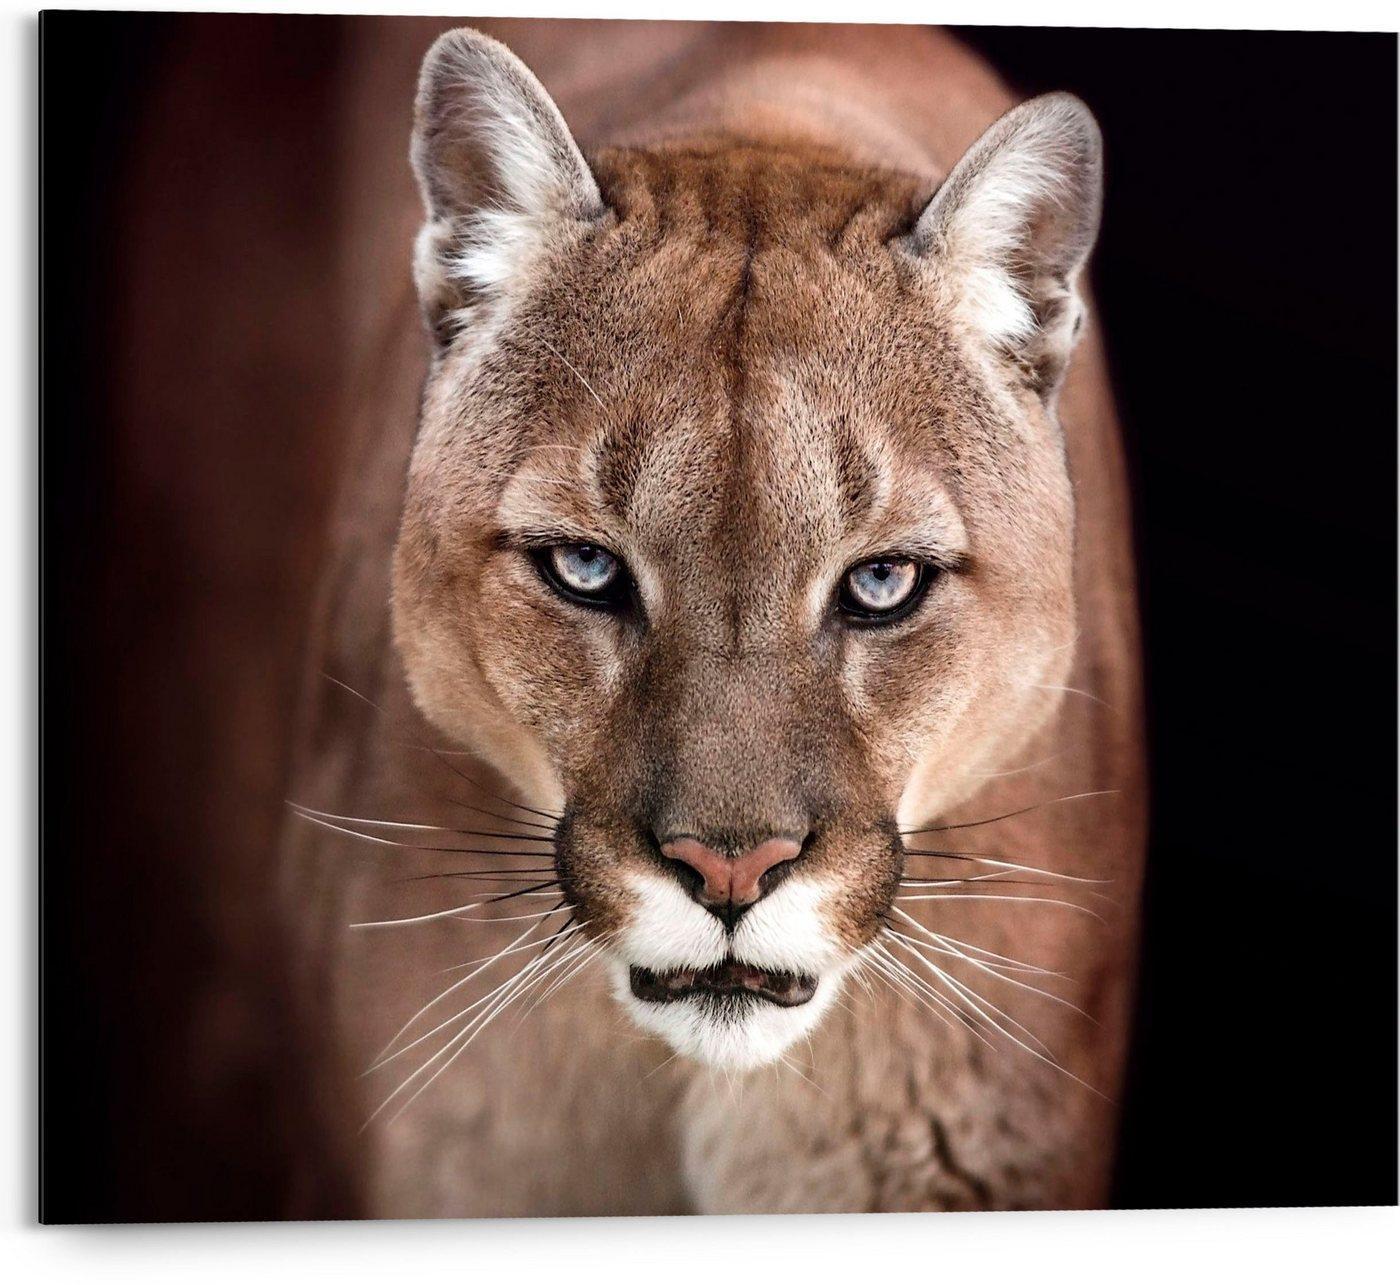 Reinders! Holzbild »Cougar - close-up«, (1 Stück)